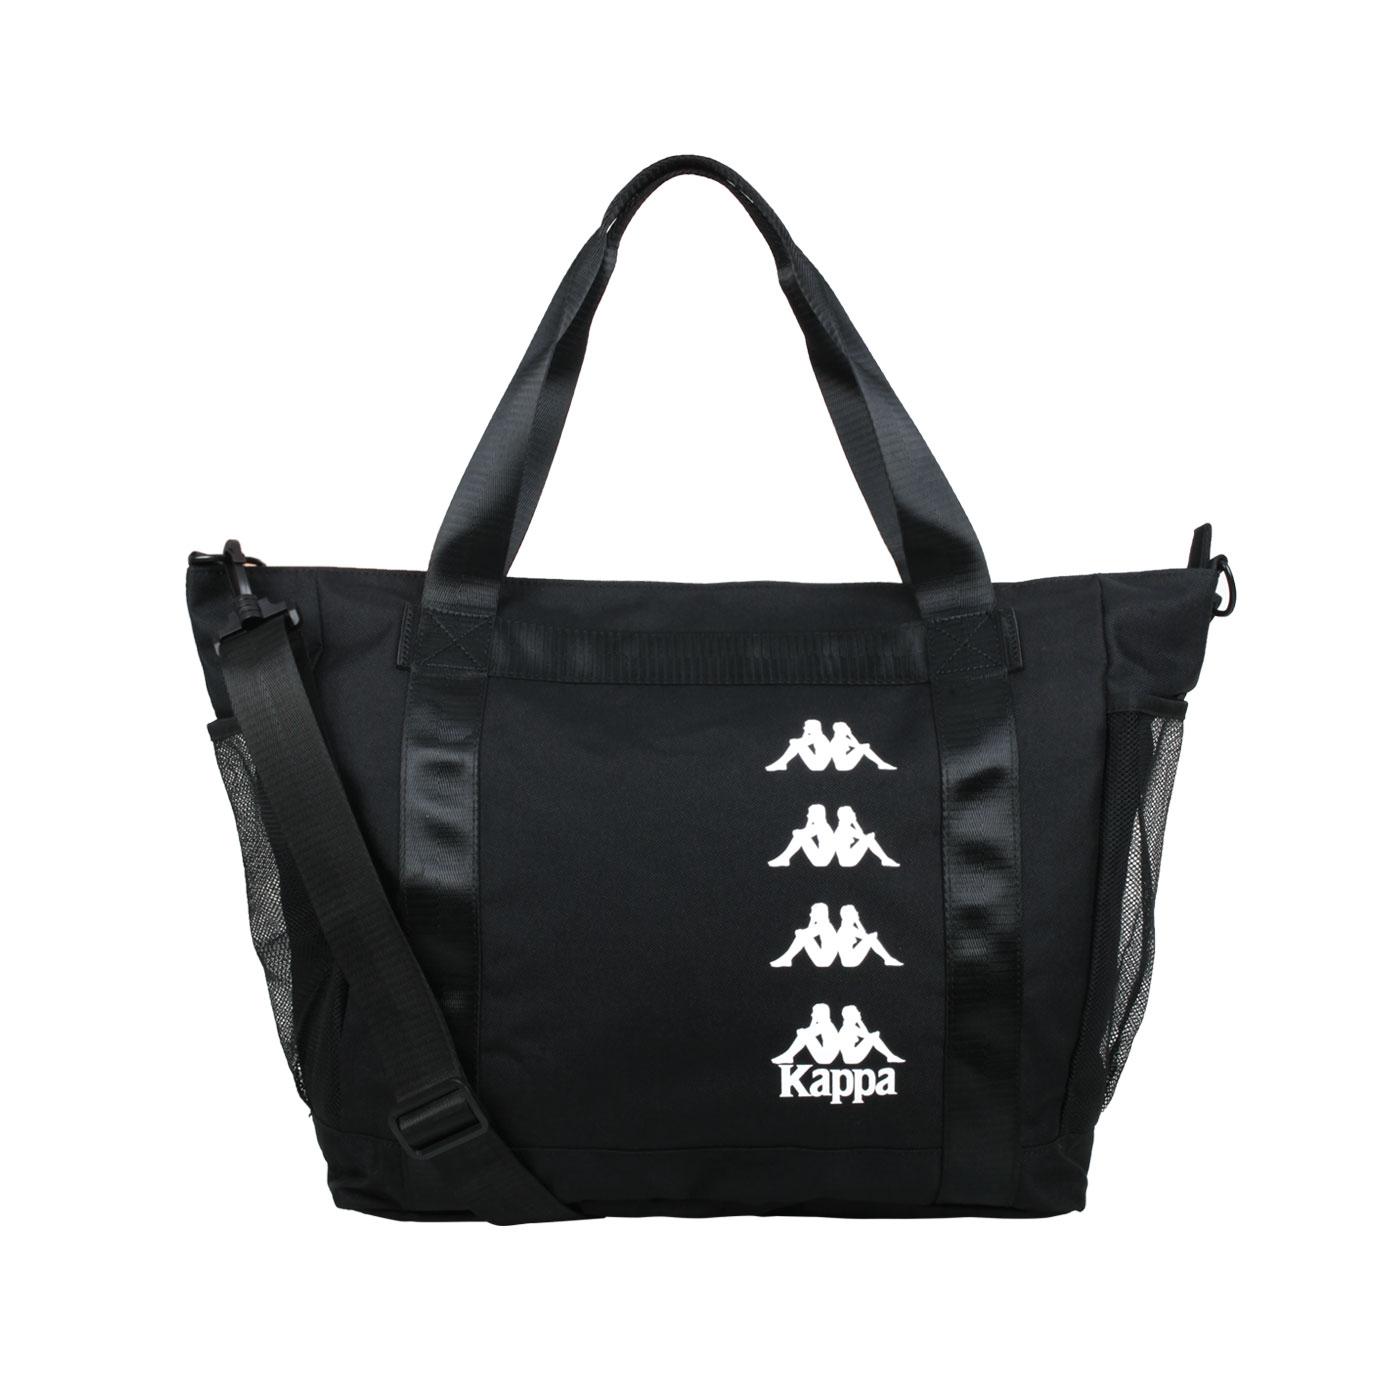 KAPPA 側背包 35168IW-005